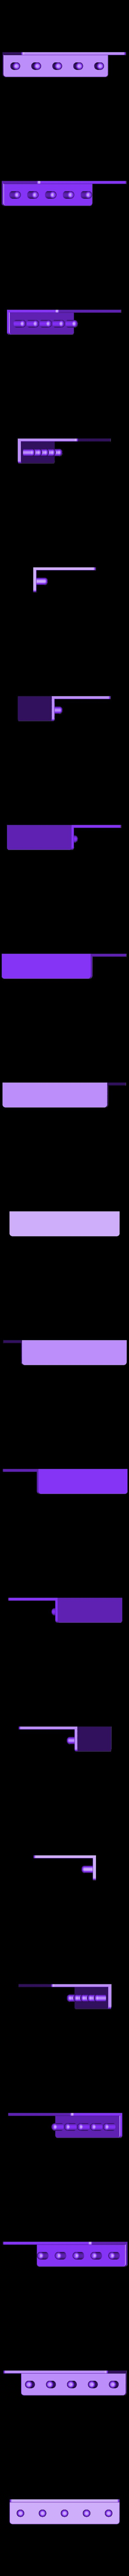 Screws.stl Download free STL file Impact Socket Holder Set 5pcs 1/2 Inch 017 I for screws or peg board • 3D printing template, Wiesemann1893